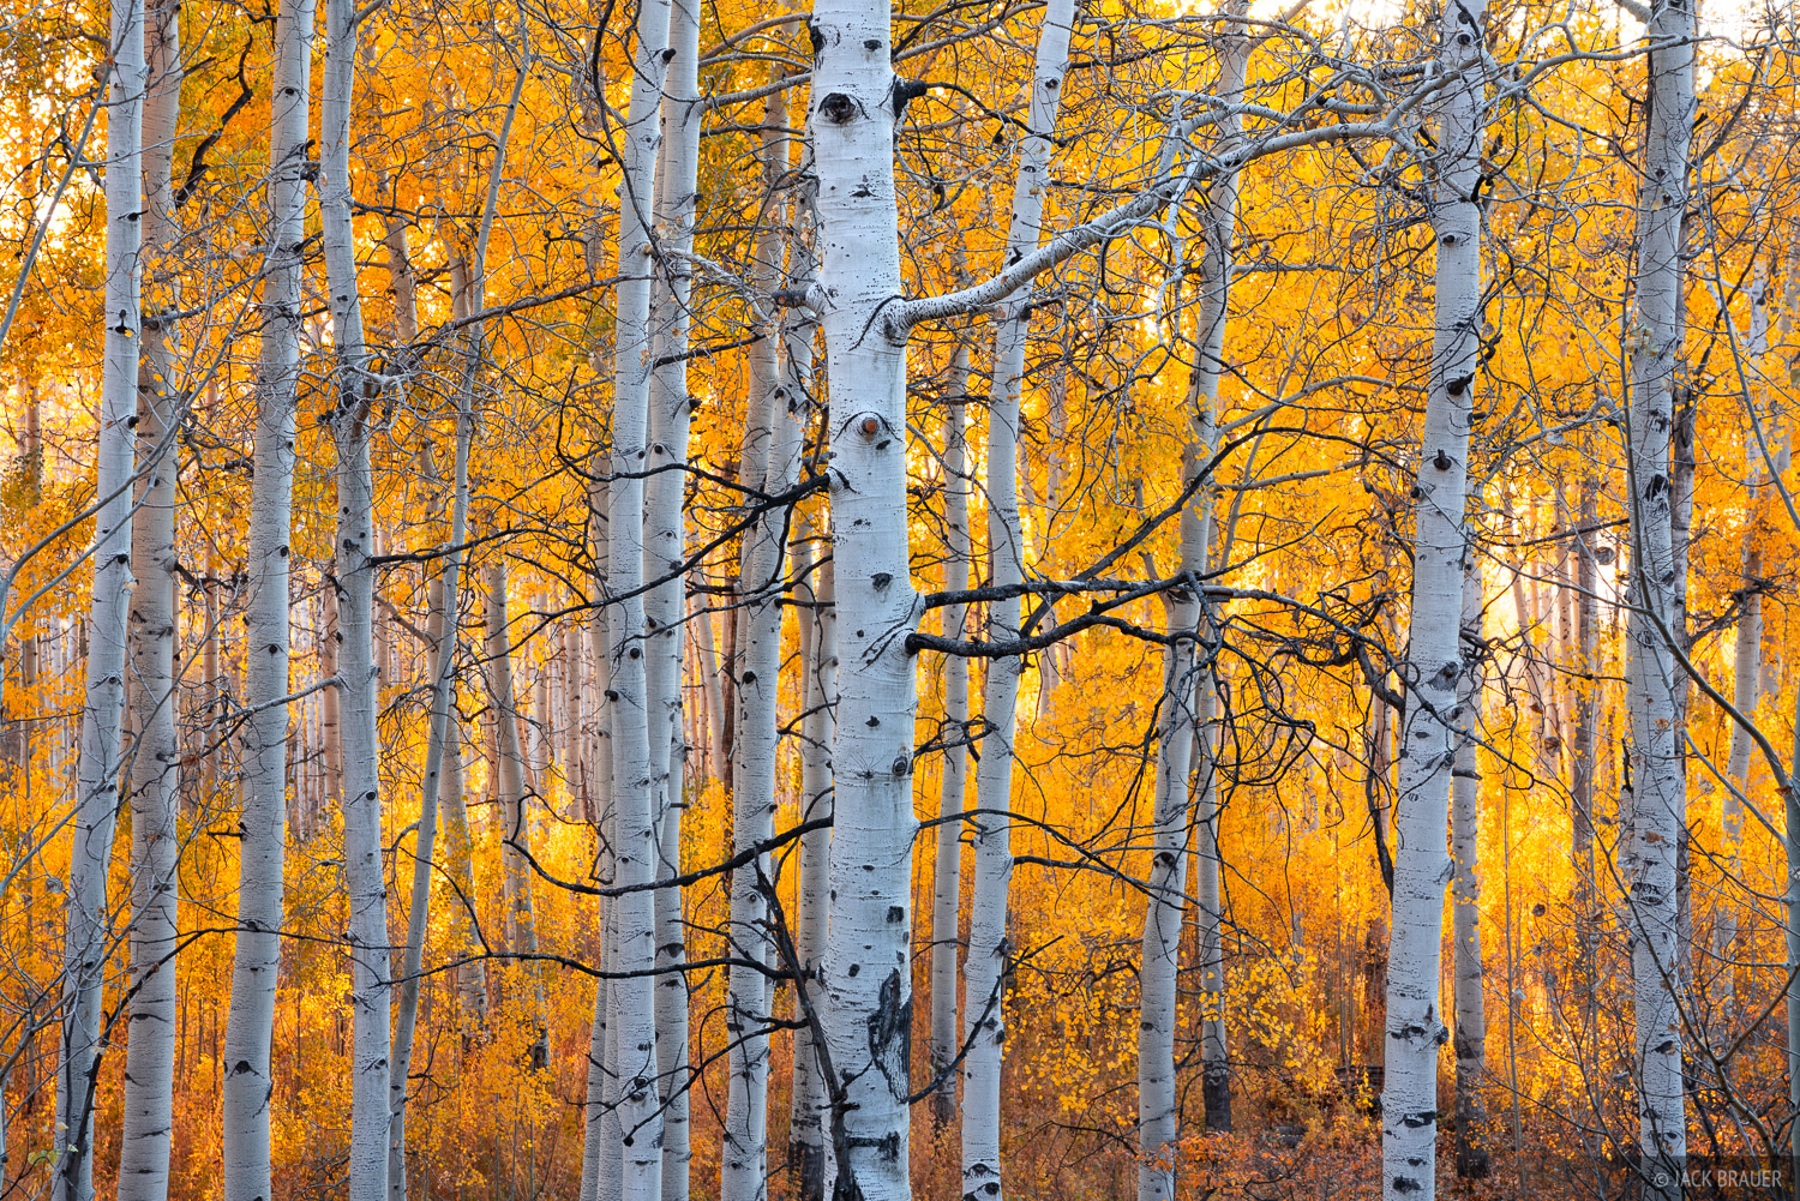 Backlit aspens in the Cimarron Range near Ridgway, Colorado.